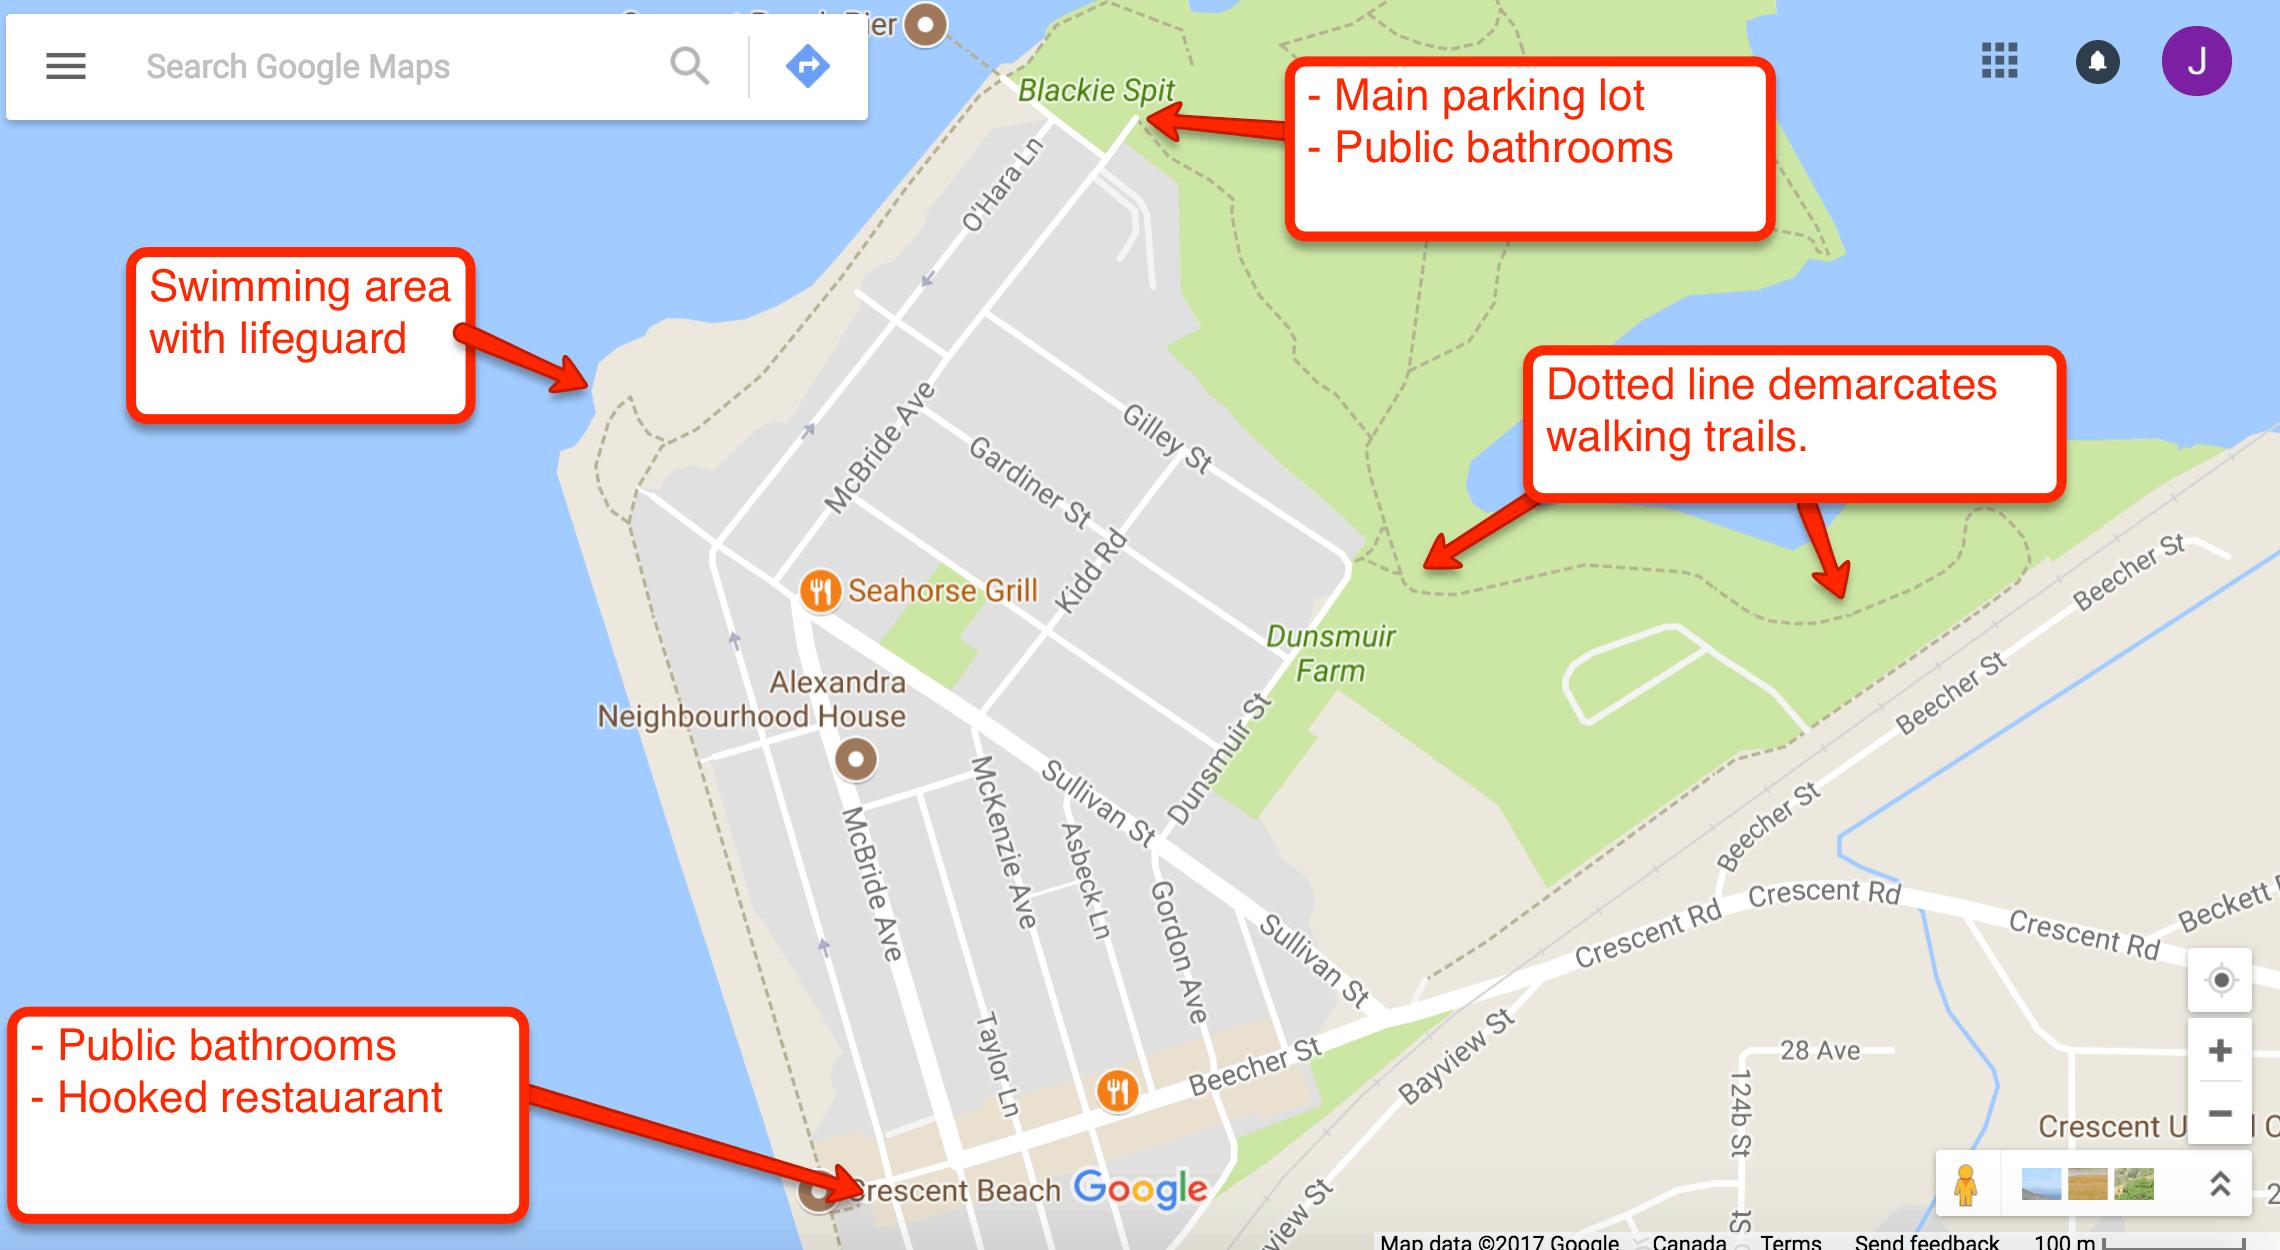 Map of Crescent Beach, BC